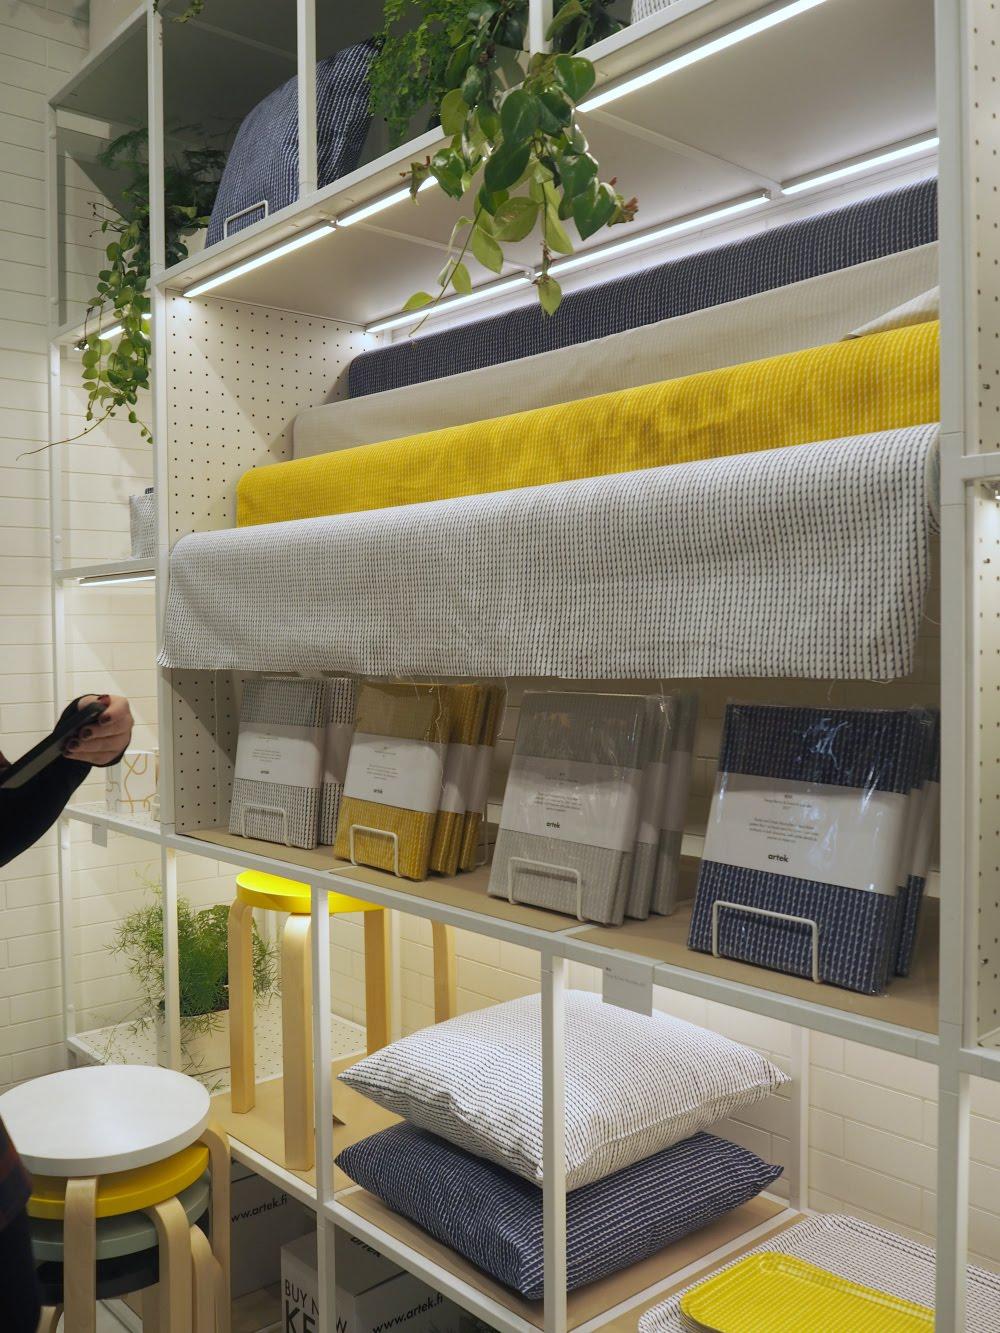 maison objet paris 2017 design highlights hello peagreen. Black Bedroom Furniture Sets. Home Design Ideas